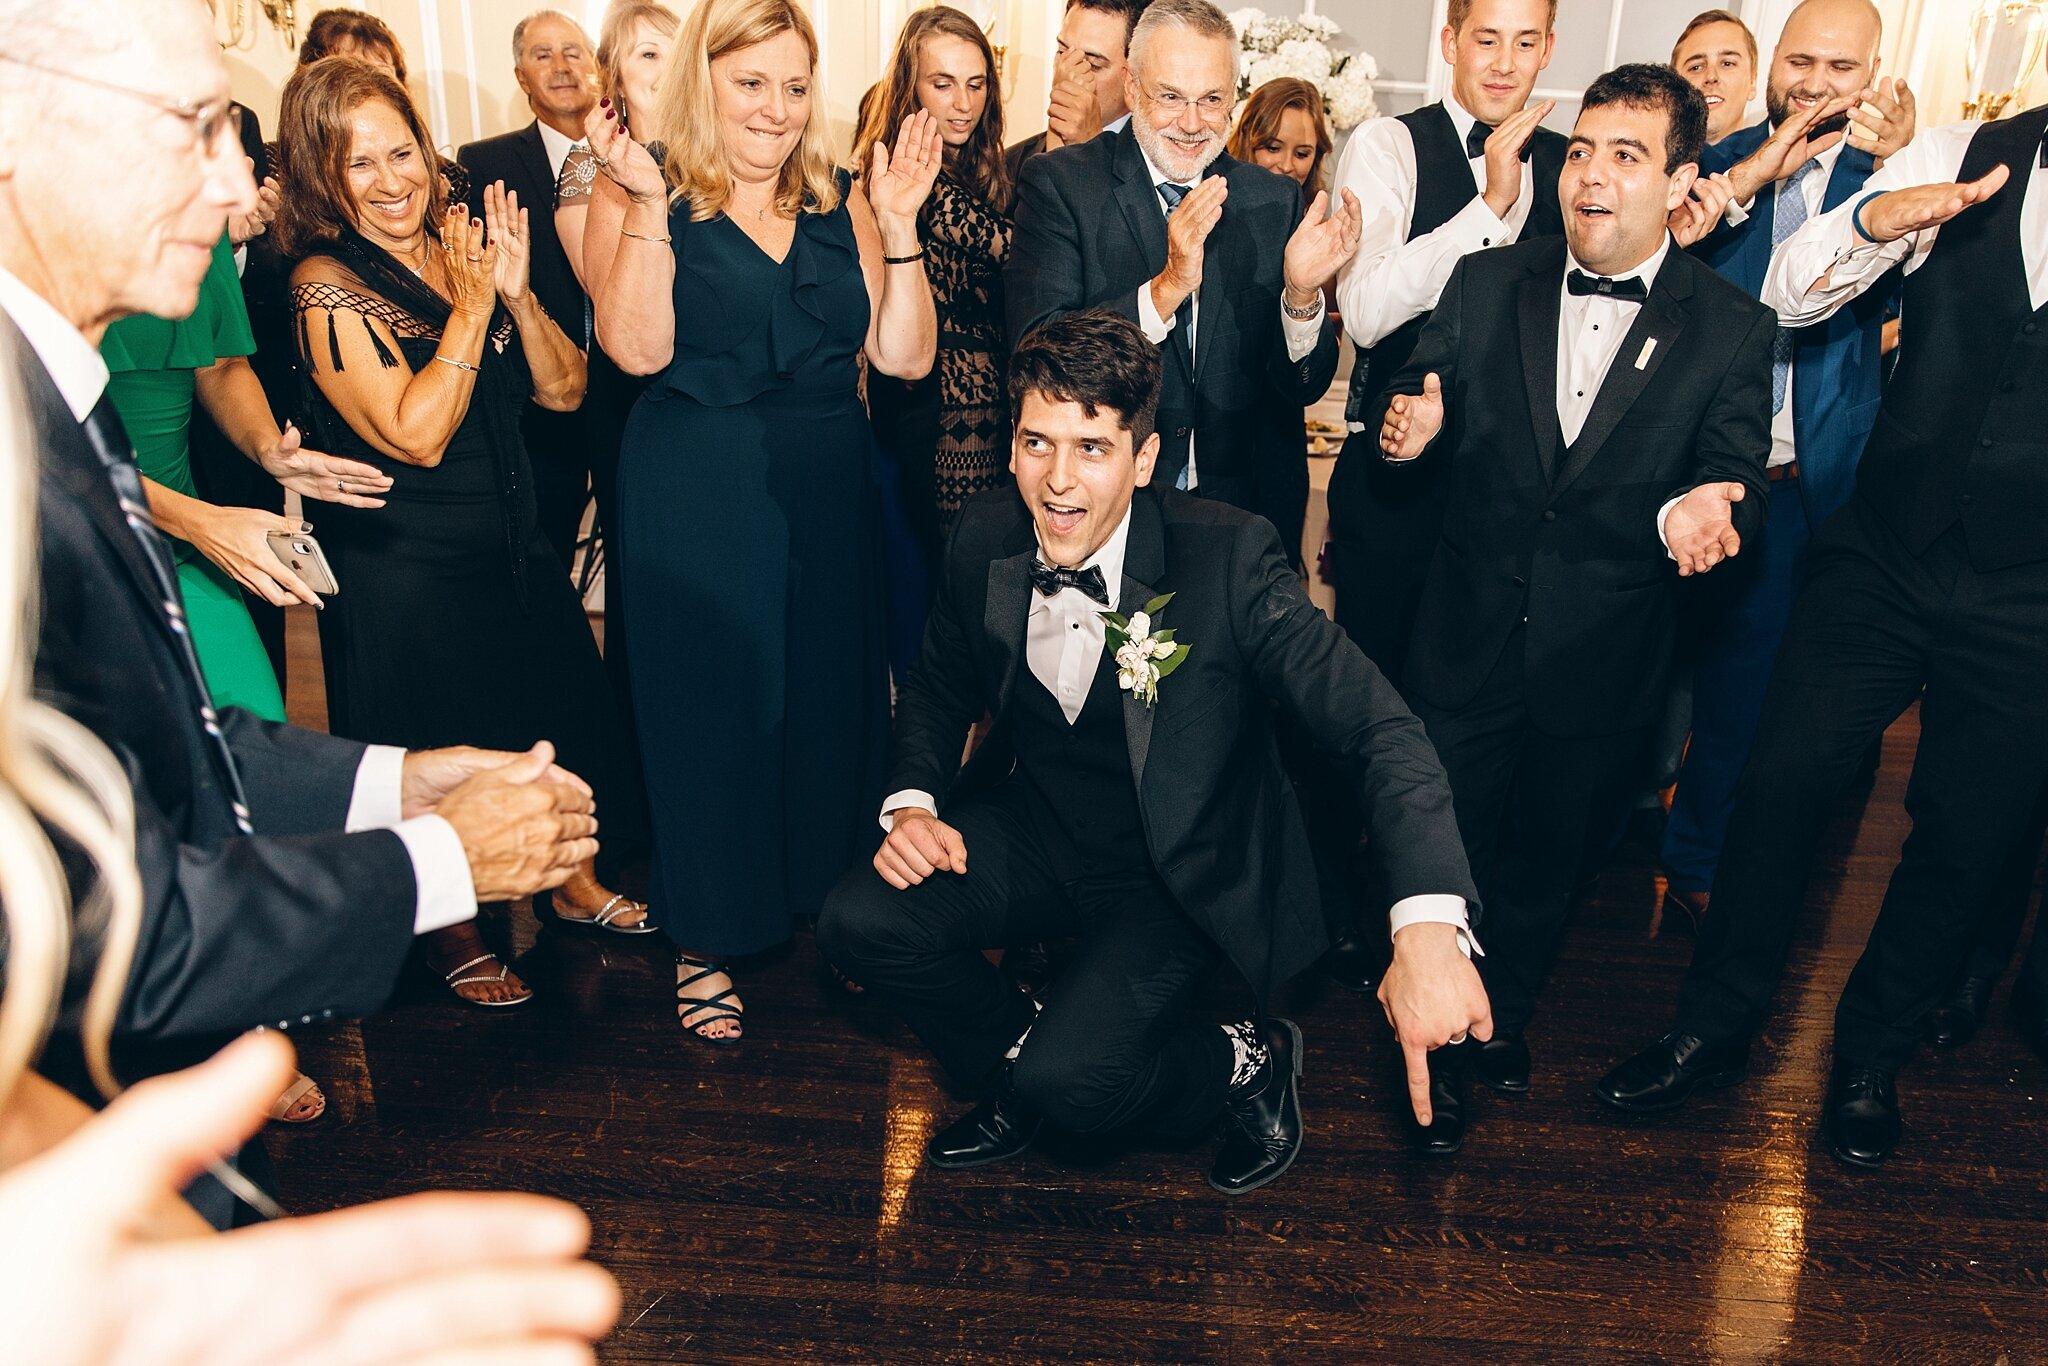 patrick-henry-ballroom-wedding-roanoke_0547.jpg